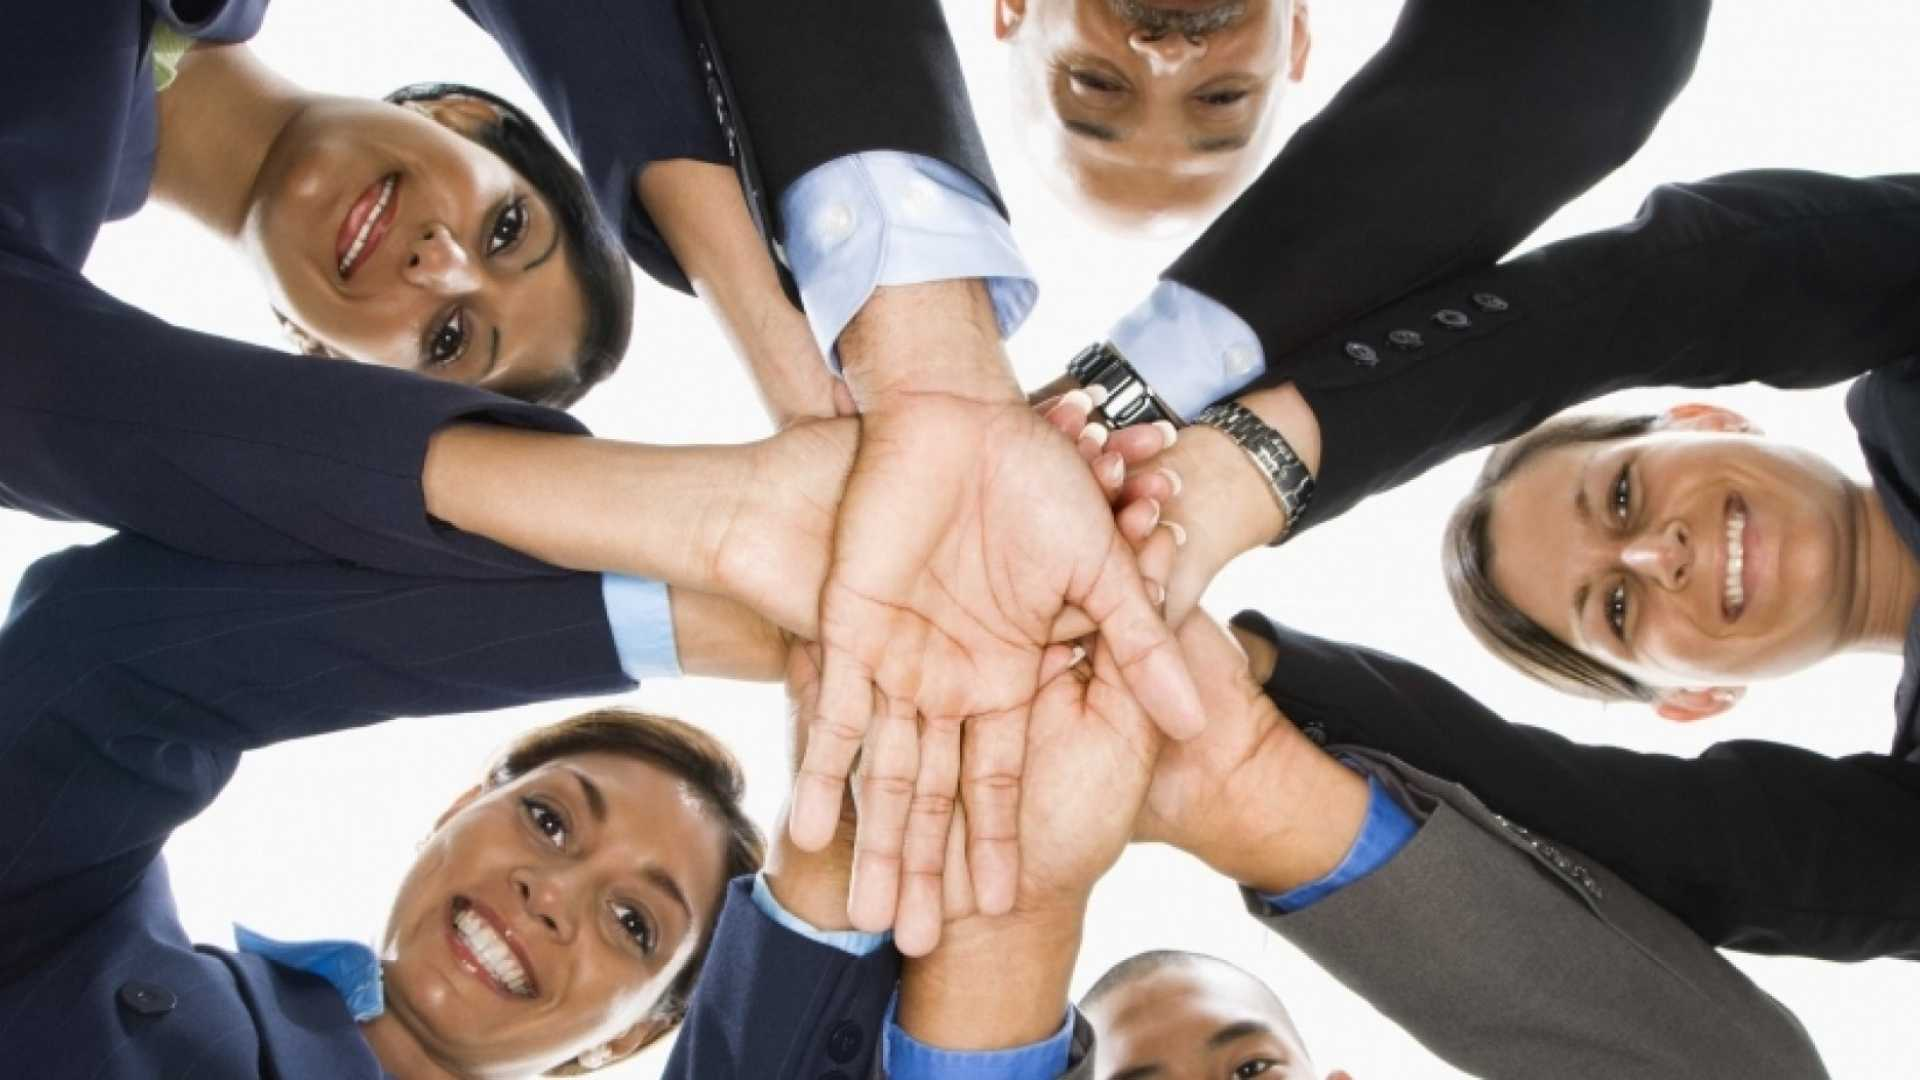 4 Rules for Enhancing Teamwork